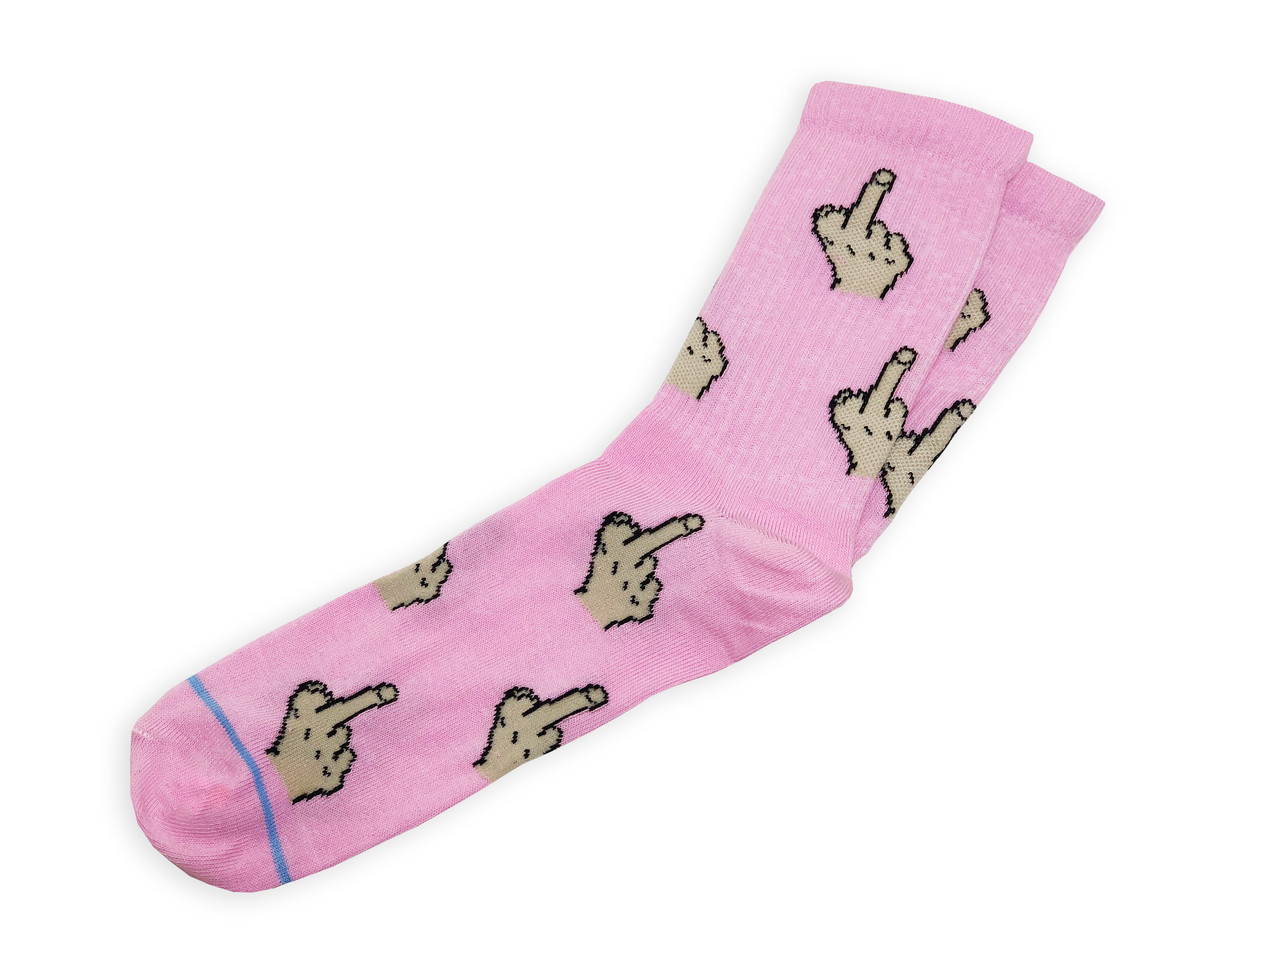 Женские носки LOMM F*ck розовые